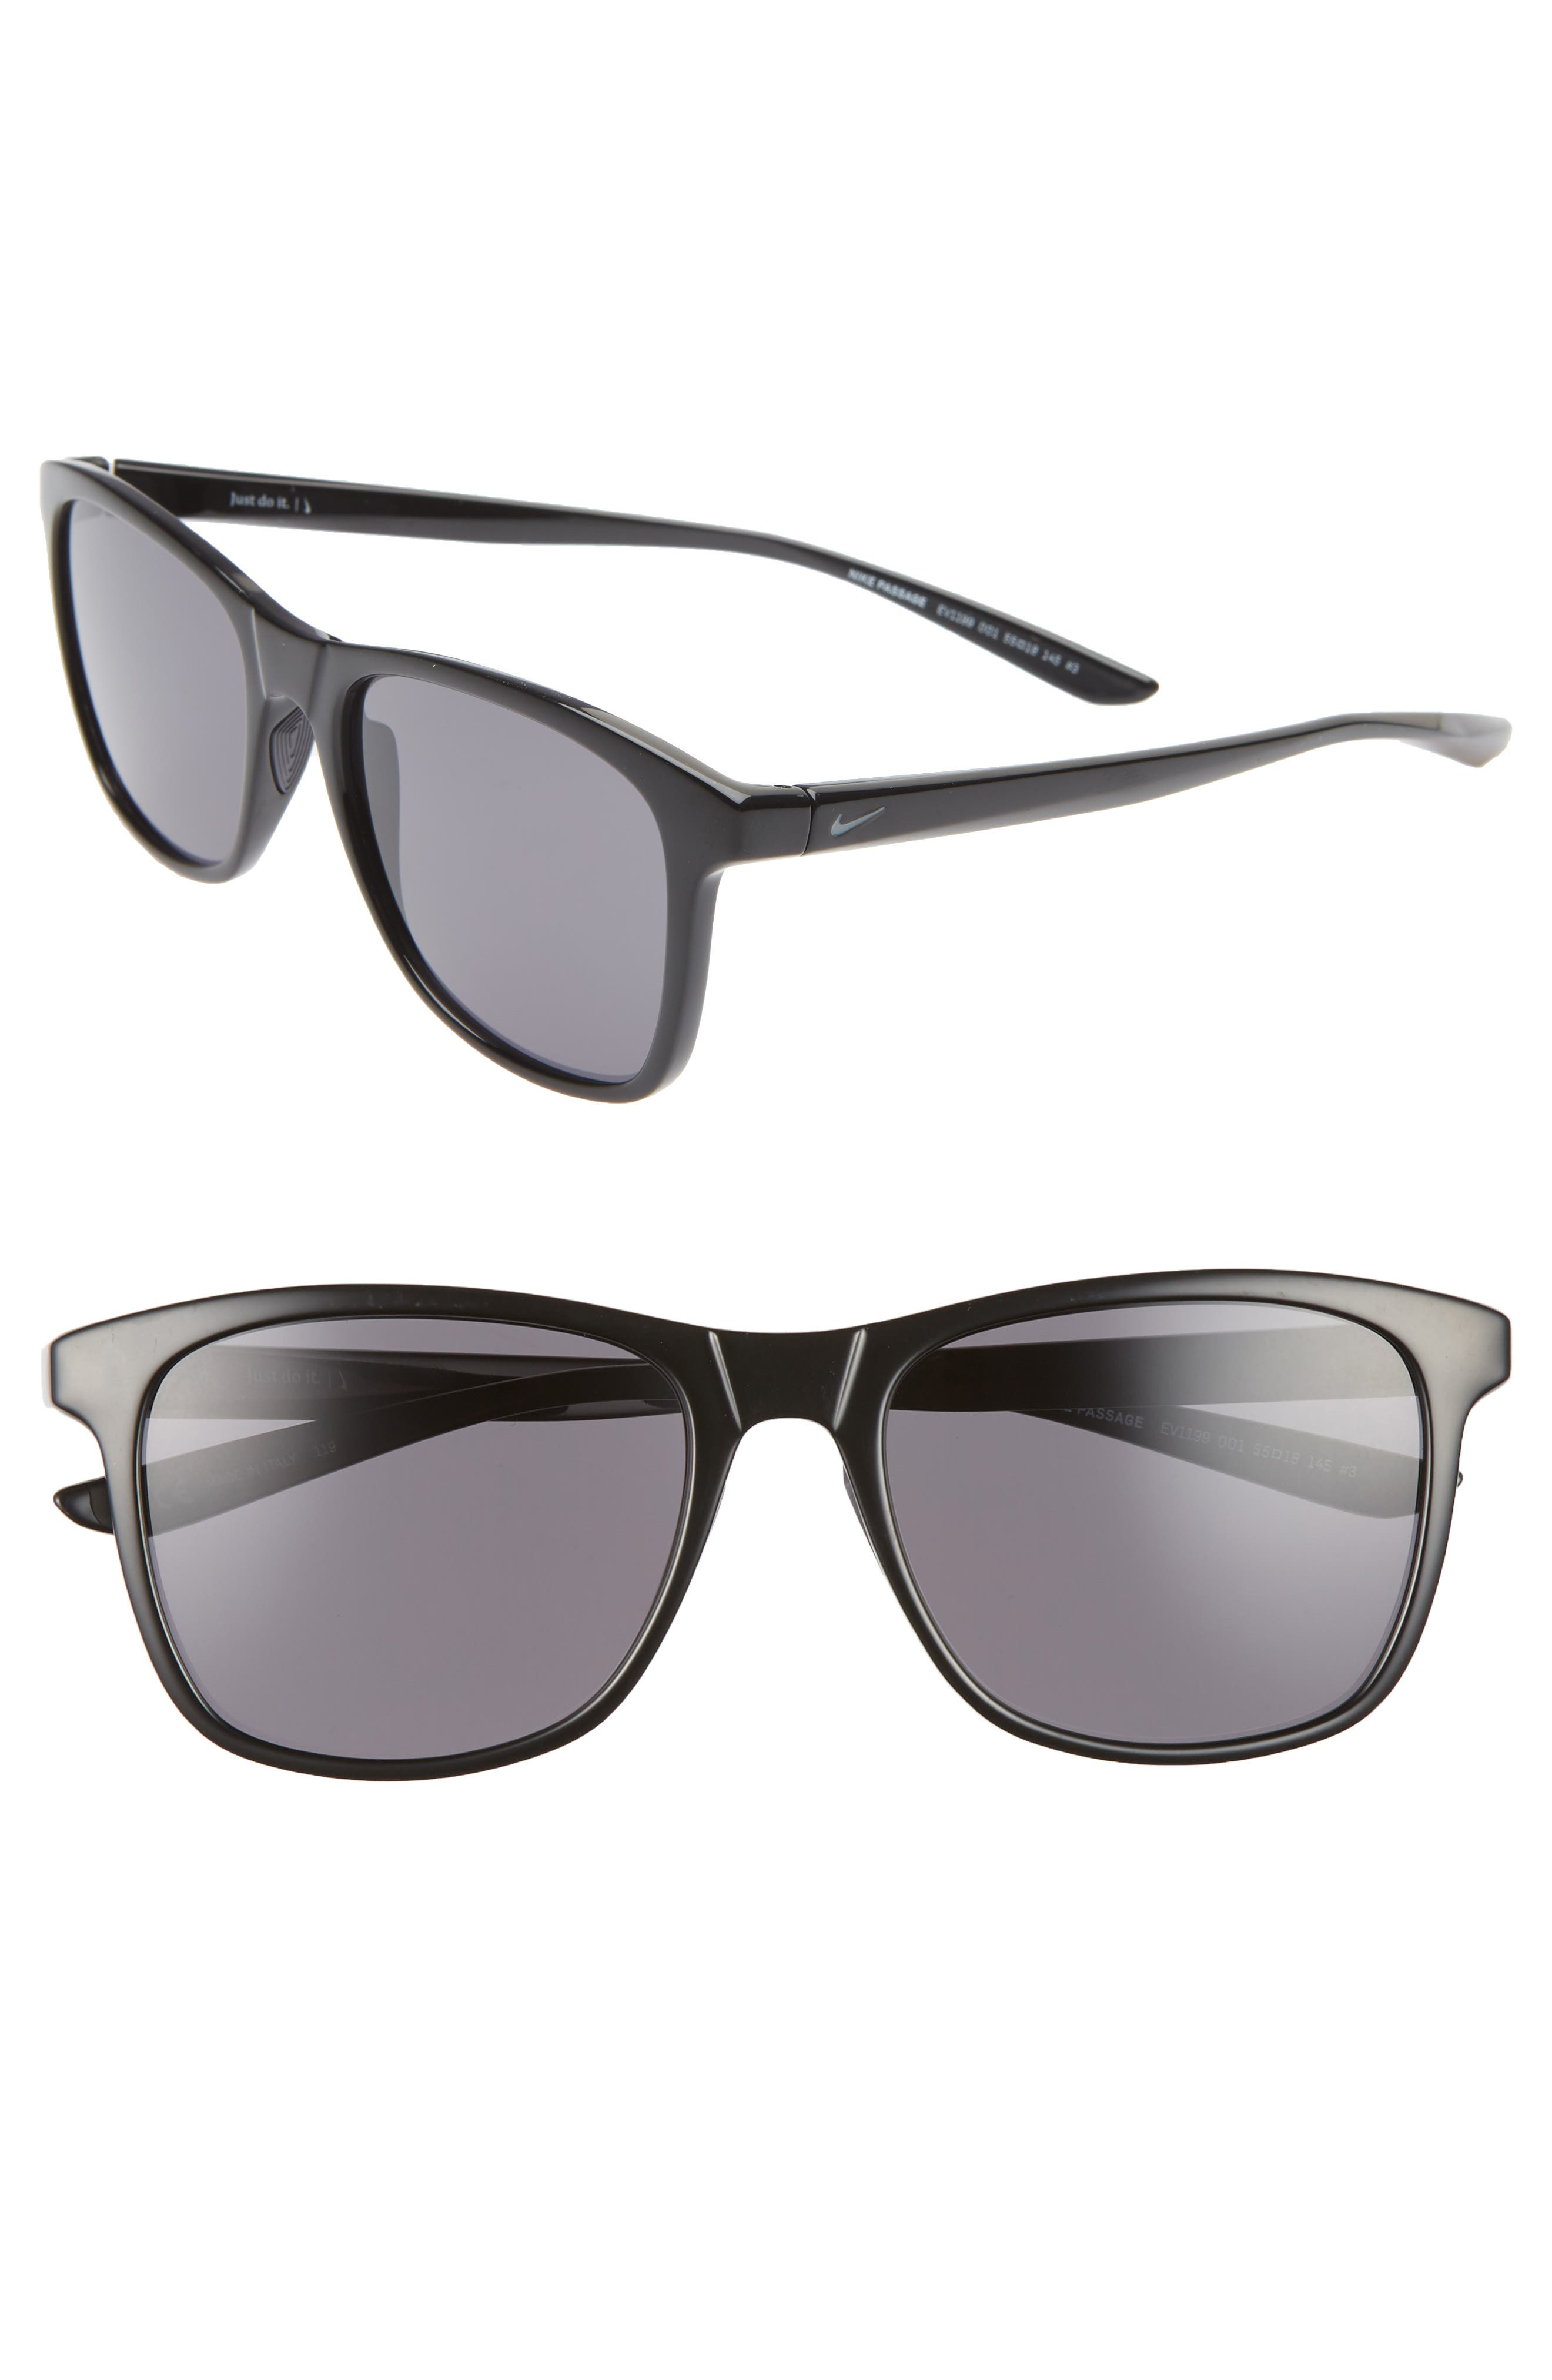 Nike Passage 55Mm Square Sunglasses - Black/ Dark Grey